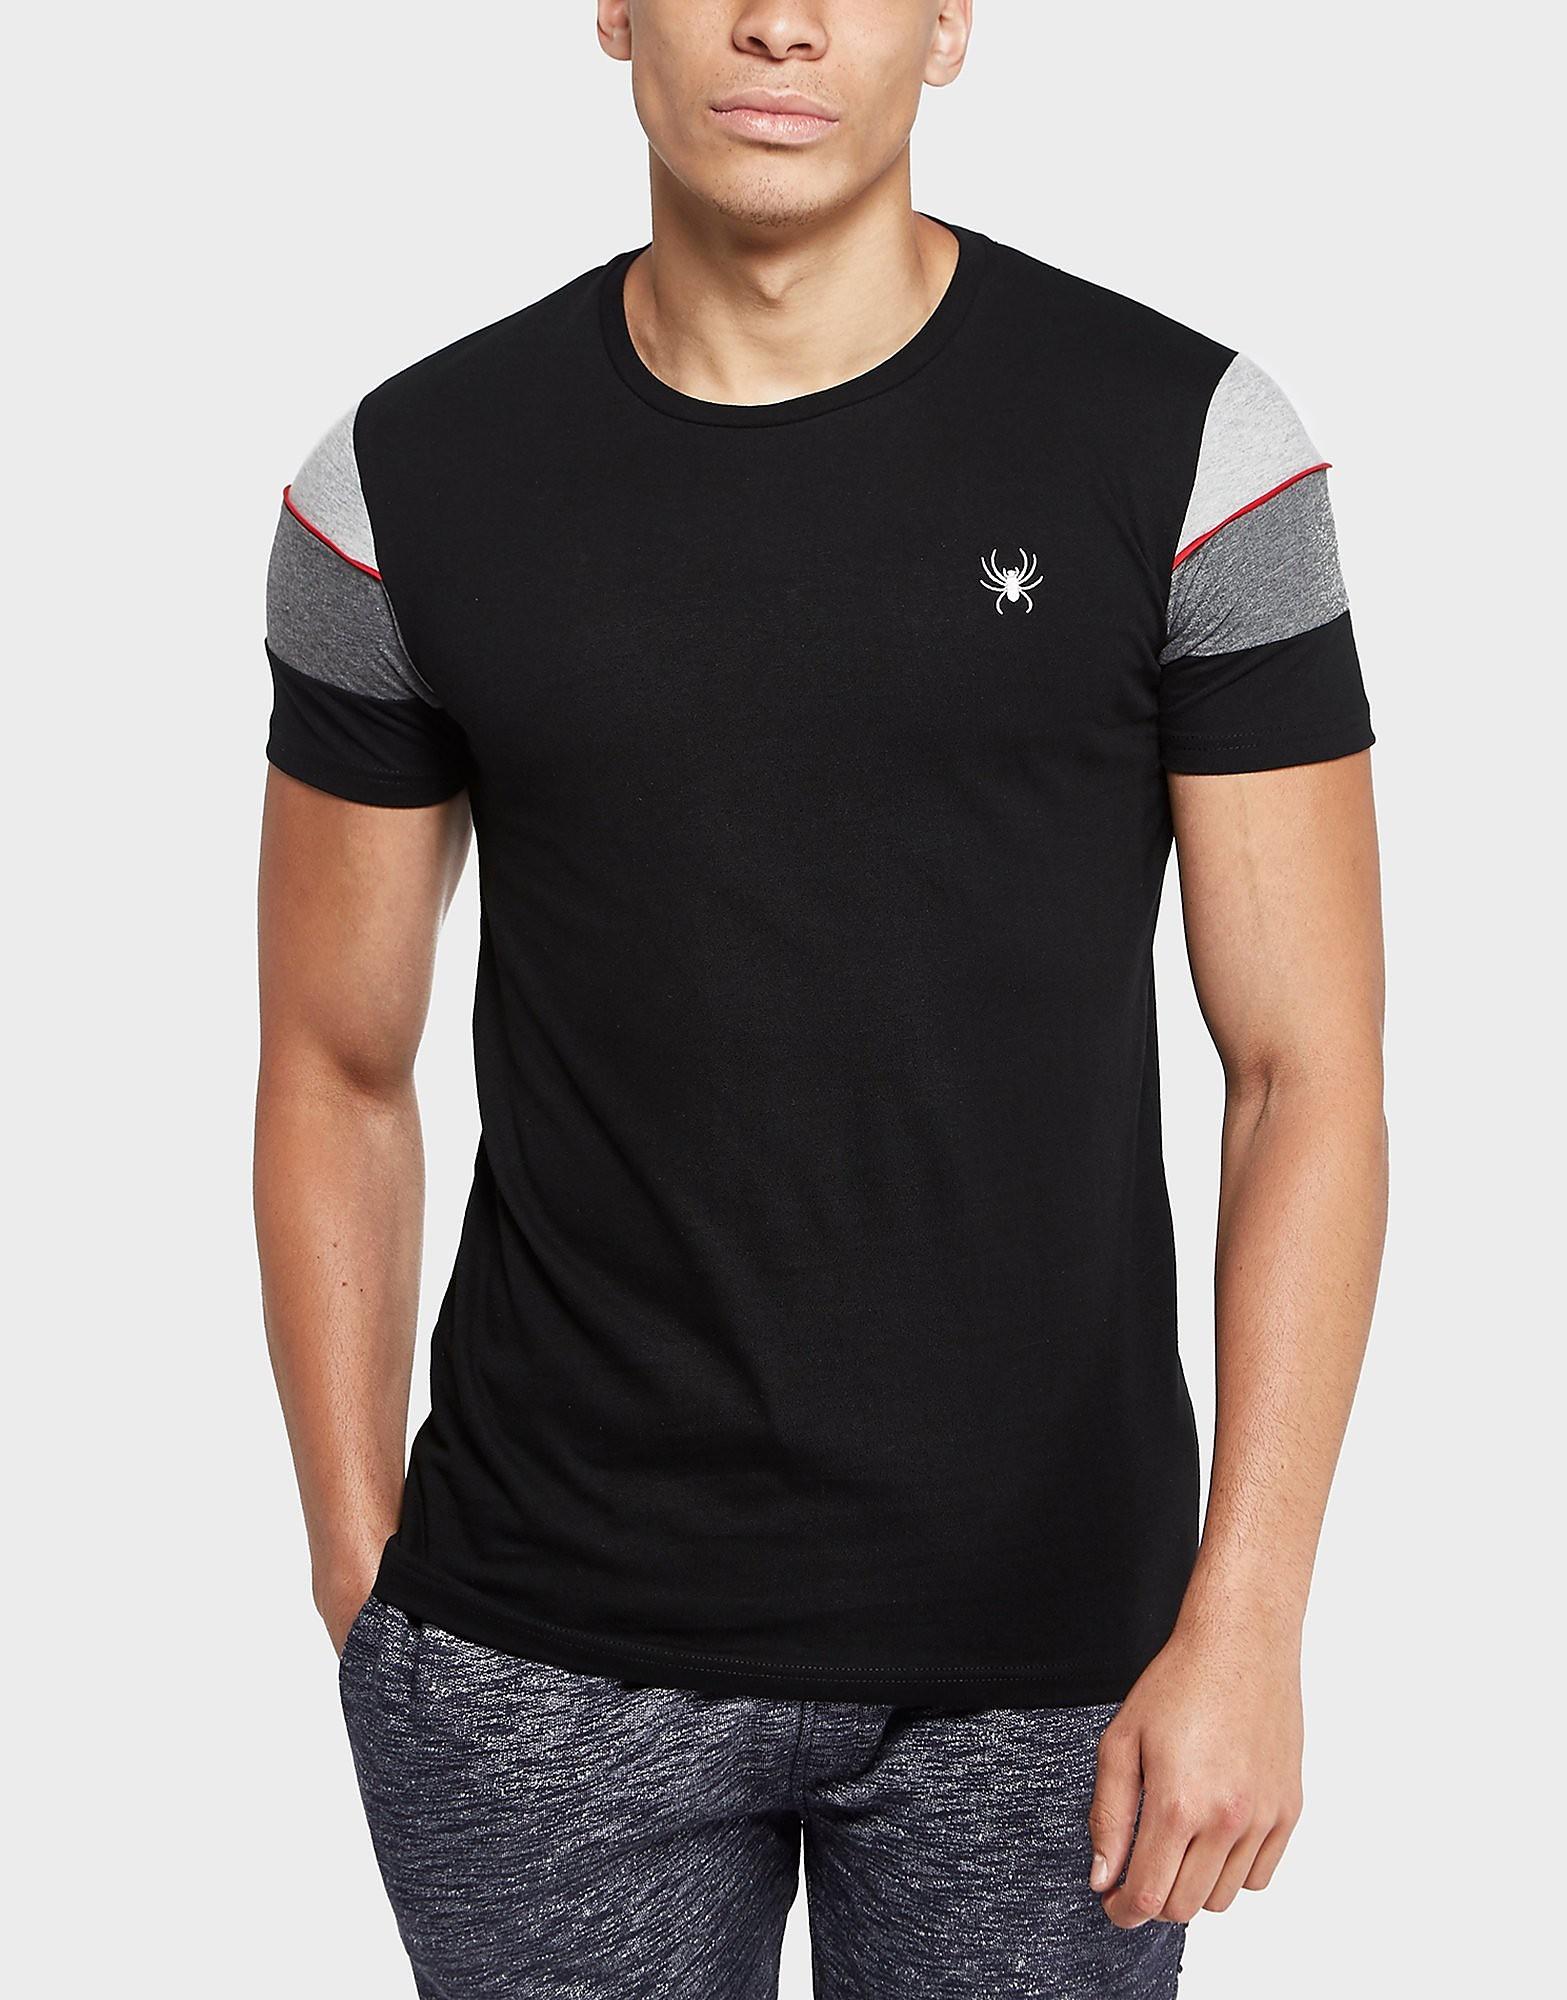 Intense Clothing Actus Short Sleeve T-Shirt